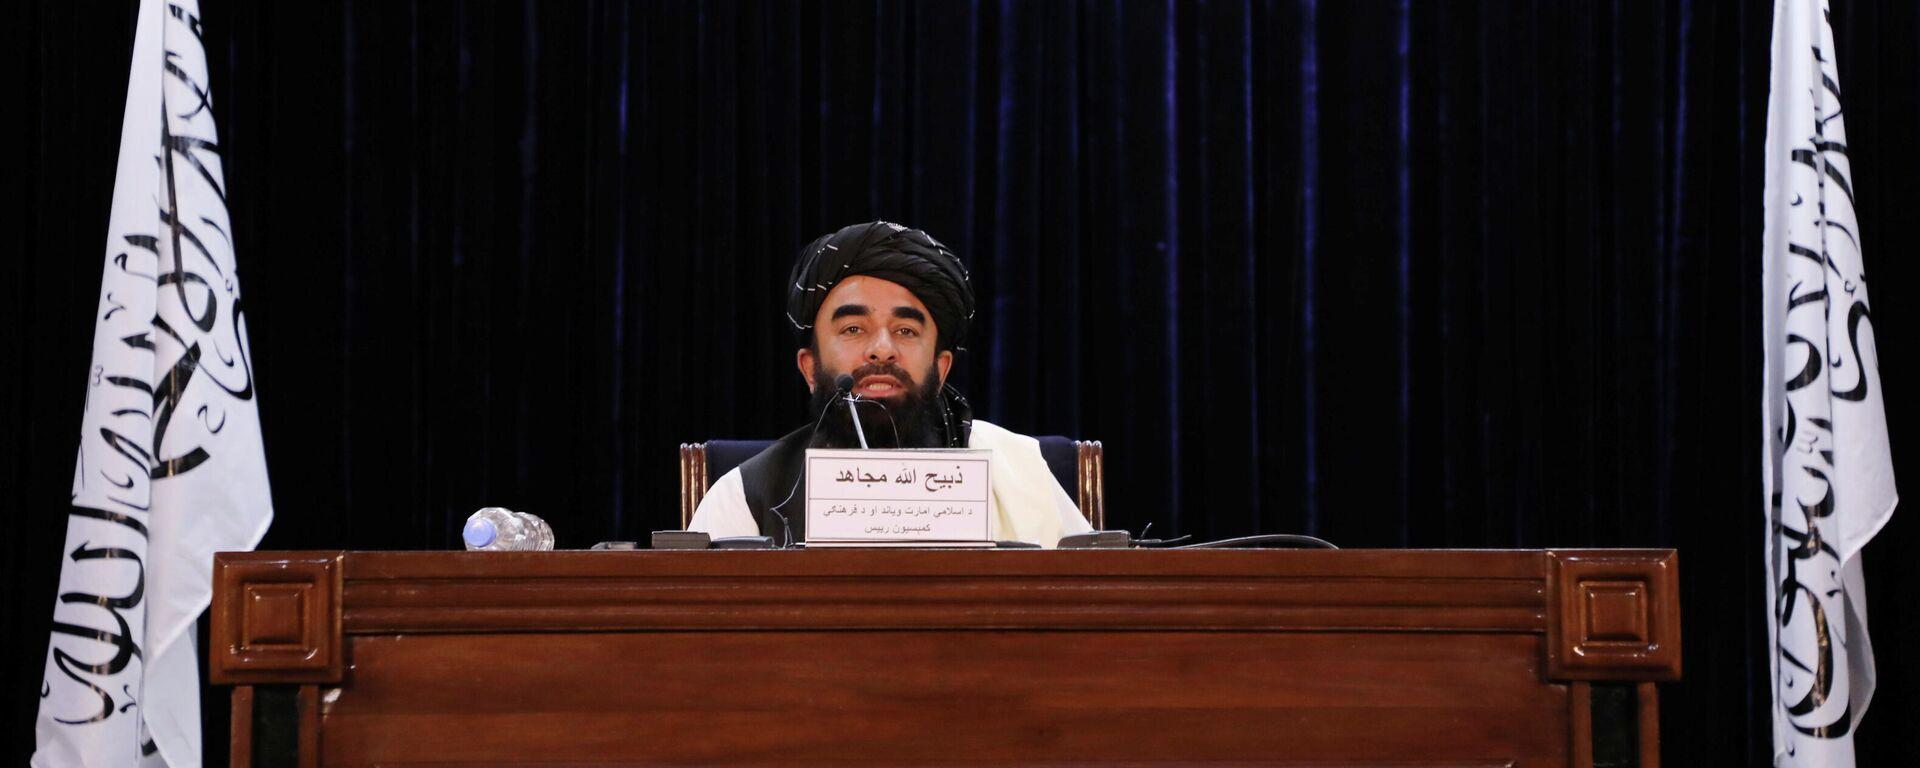 Taliban spokesman Zabihullah Mujahid speaks during a news conference in Kabul, Afghanistan September 6, 2021. REUTERS/Stringer - Sputnik International, 1920, 07.09.2021